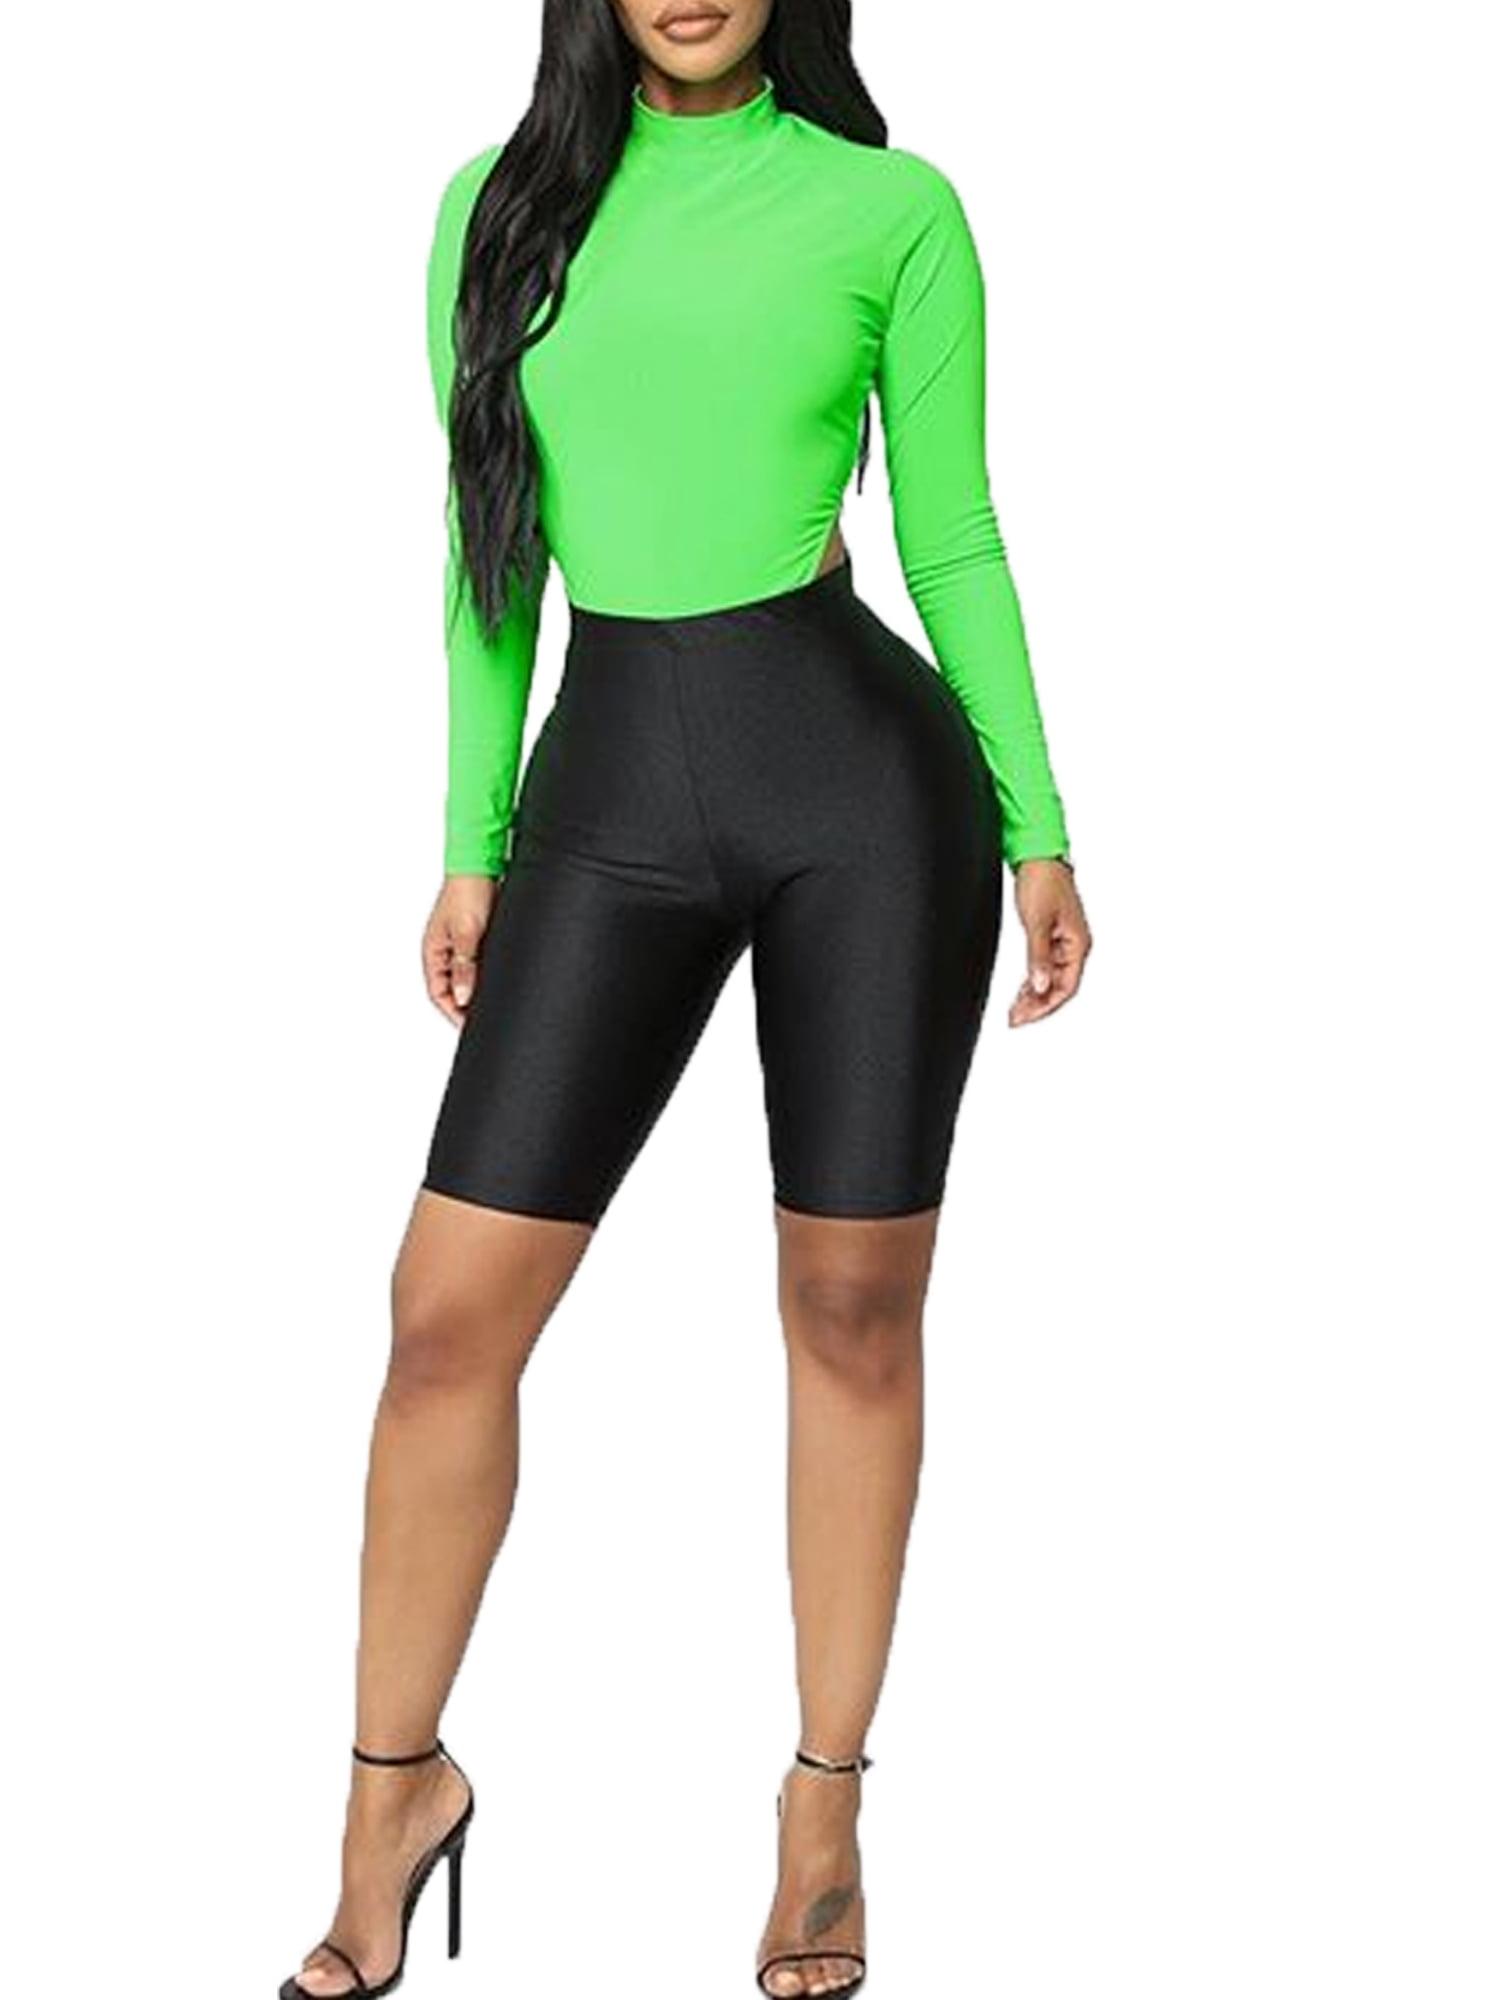 Womens Stretch Biker Bike Shorts Workout Spandex Leggings Pants Knee I6X3